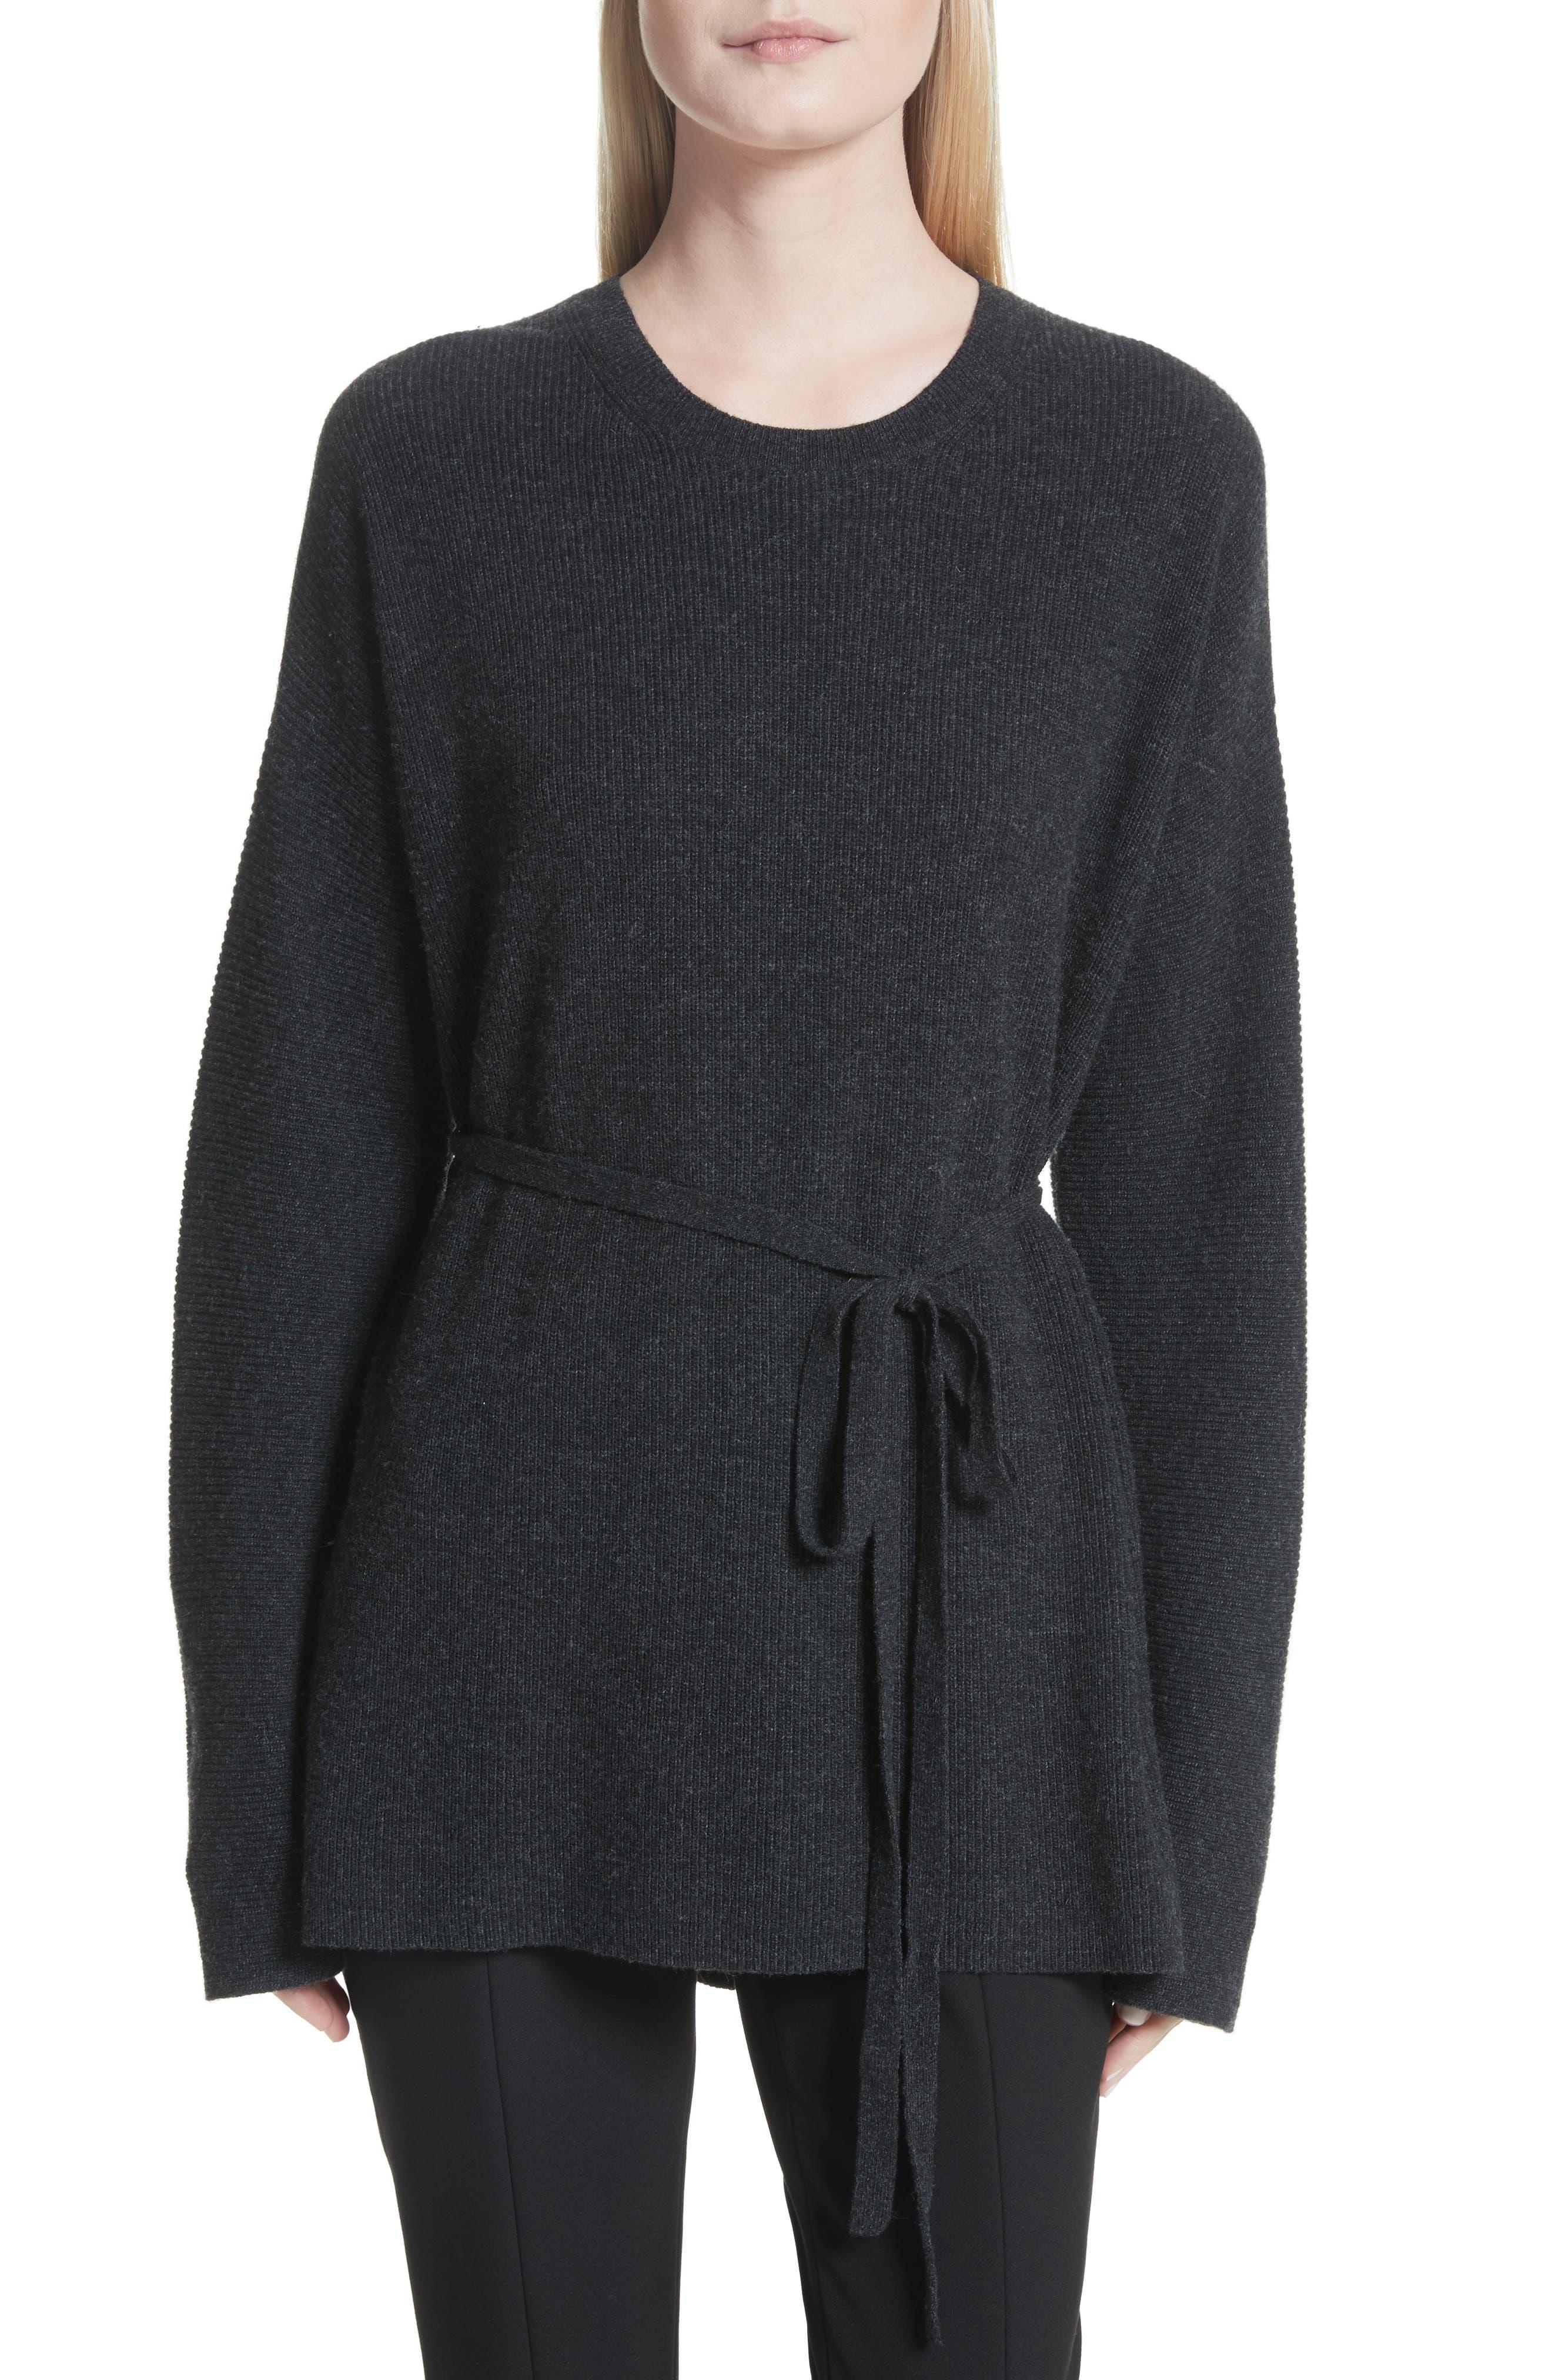 Main Image - Elizabeth and James Gisella Slouchy Sweater